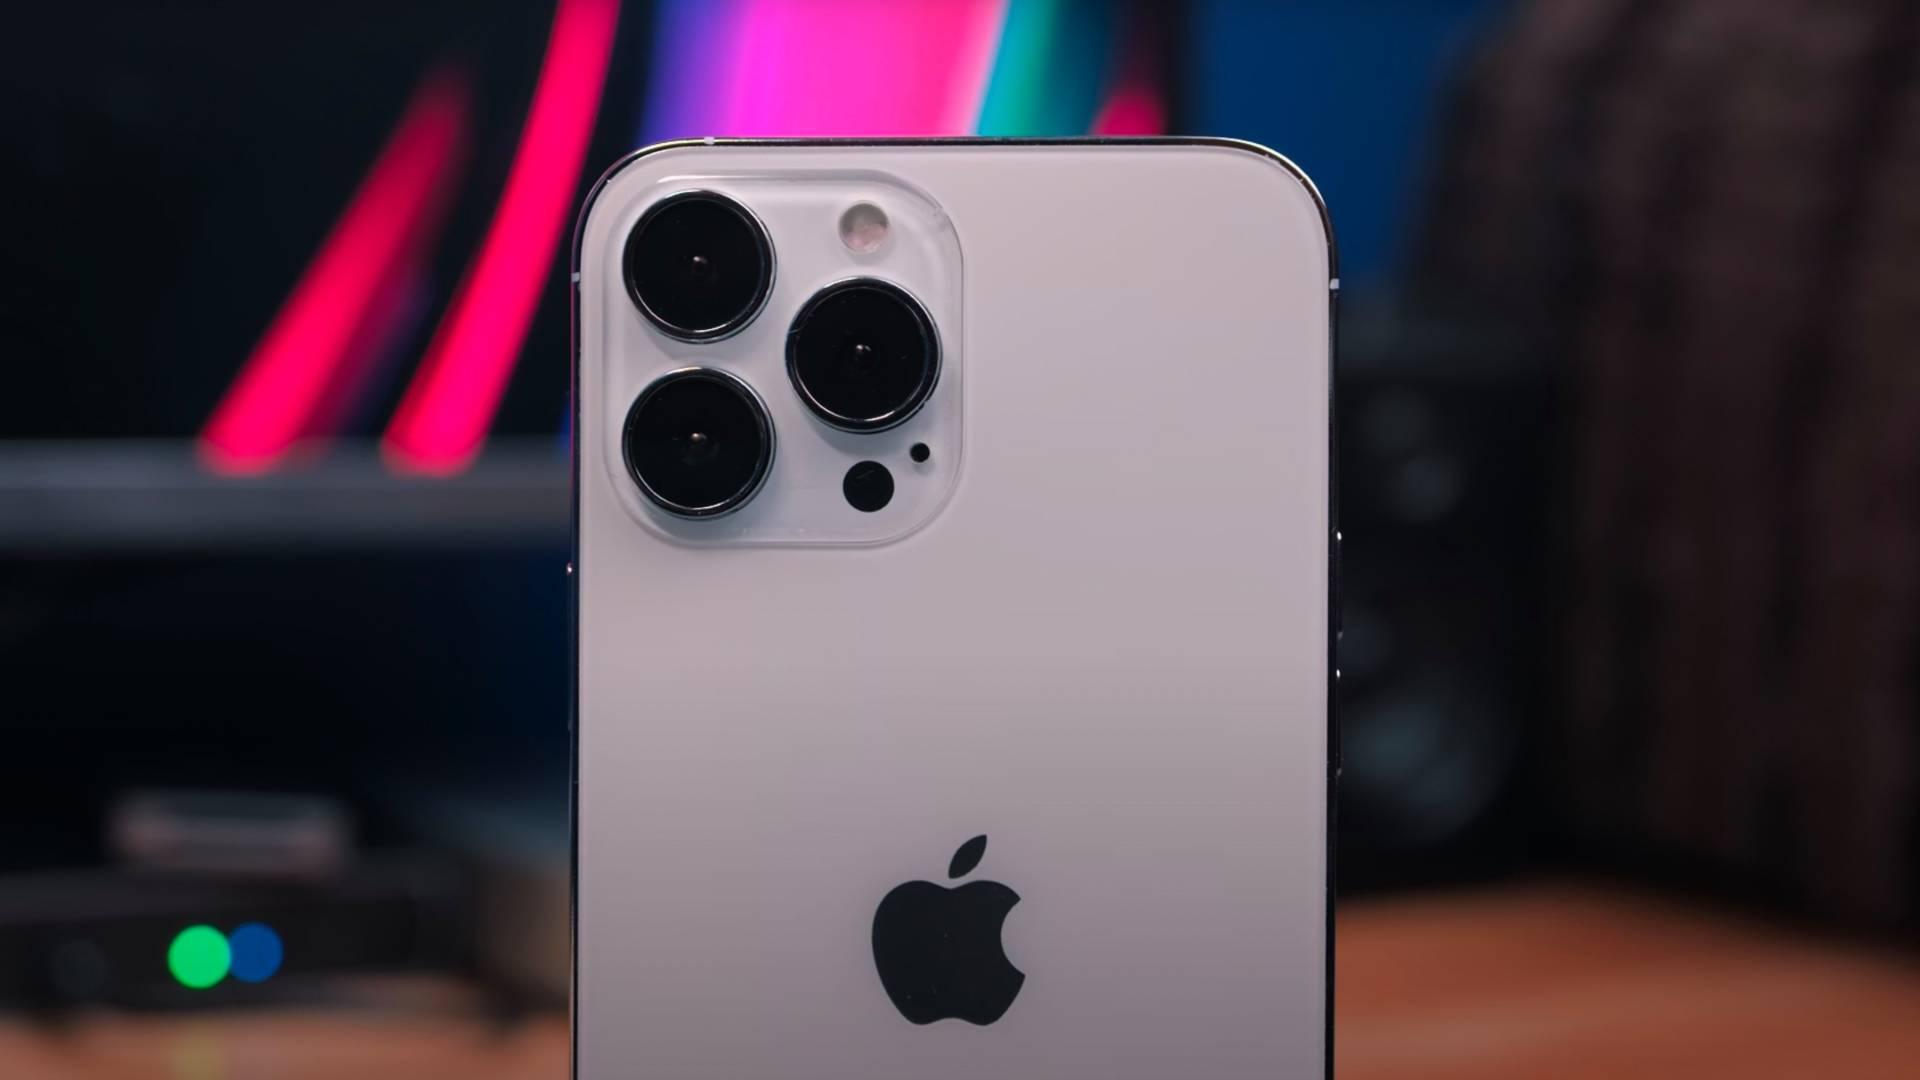 iphone 13 series price